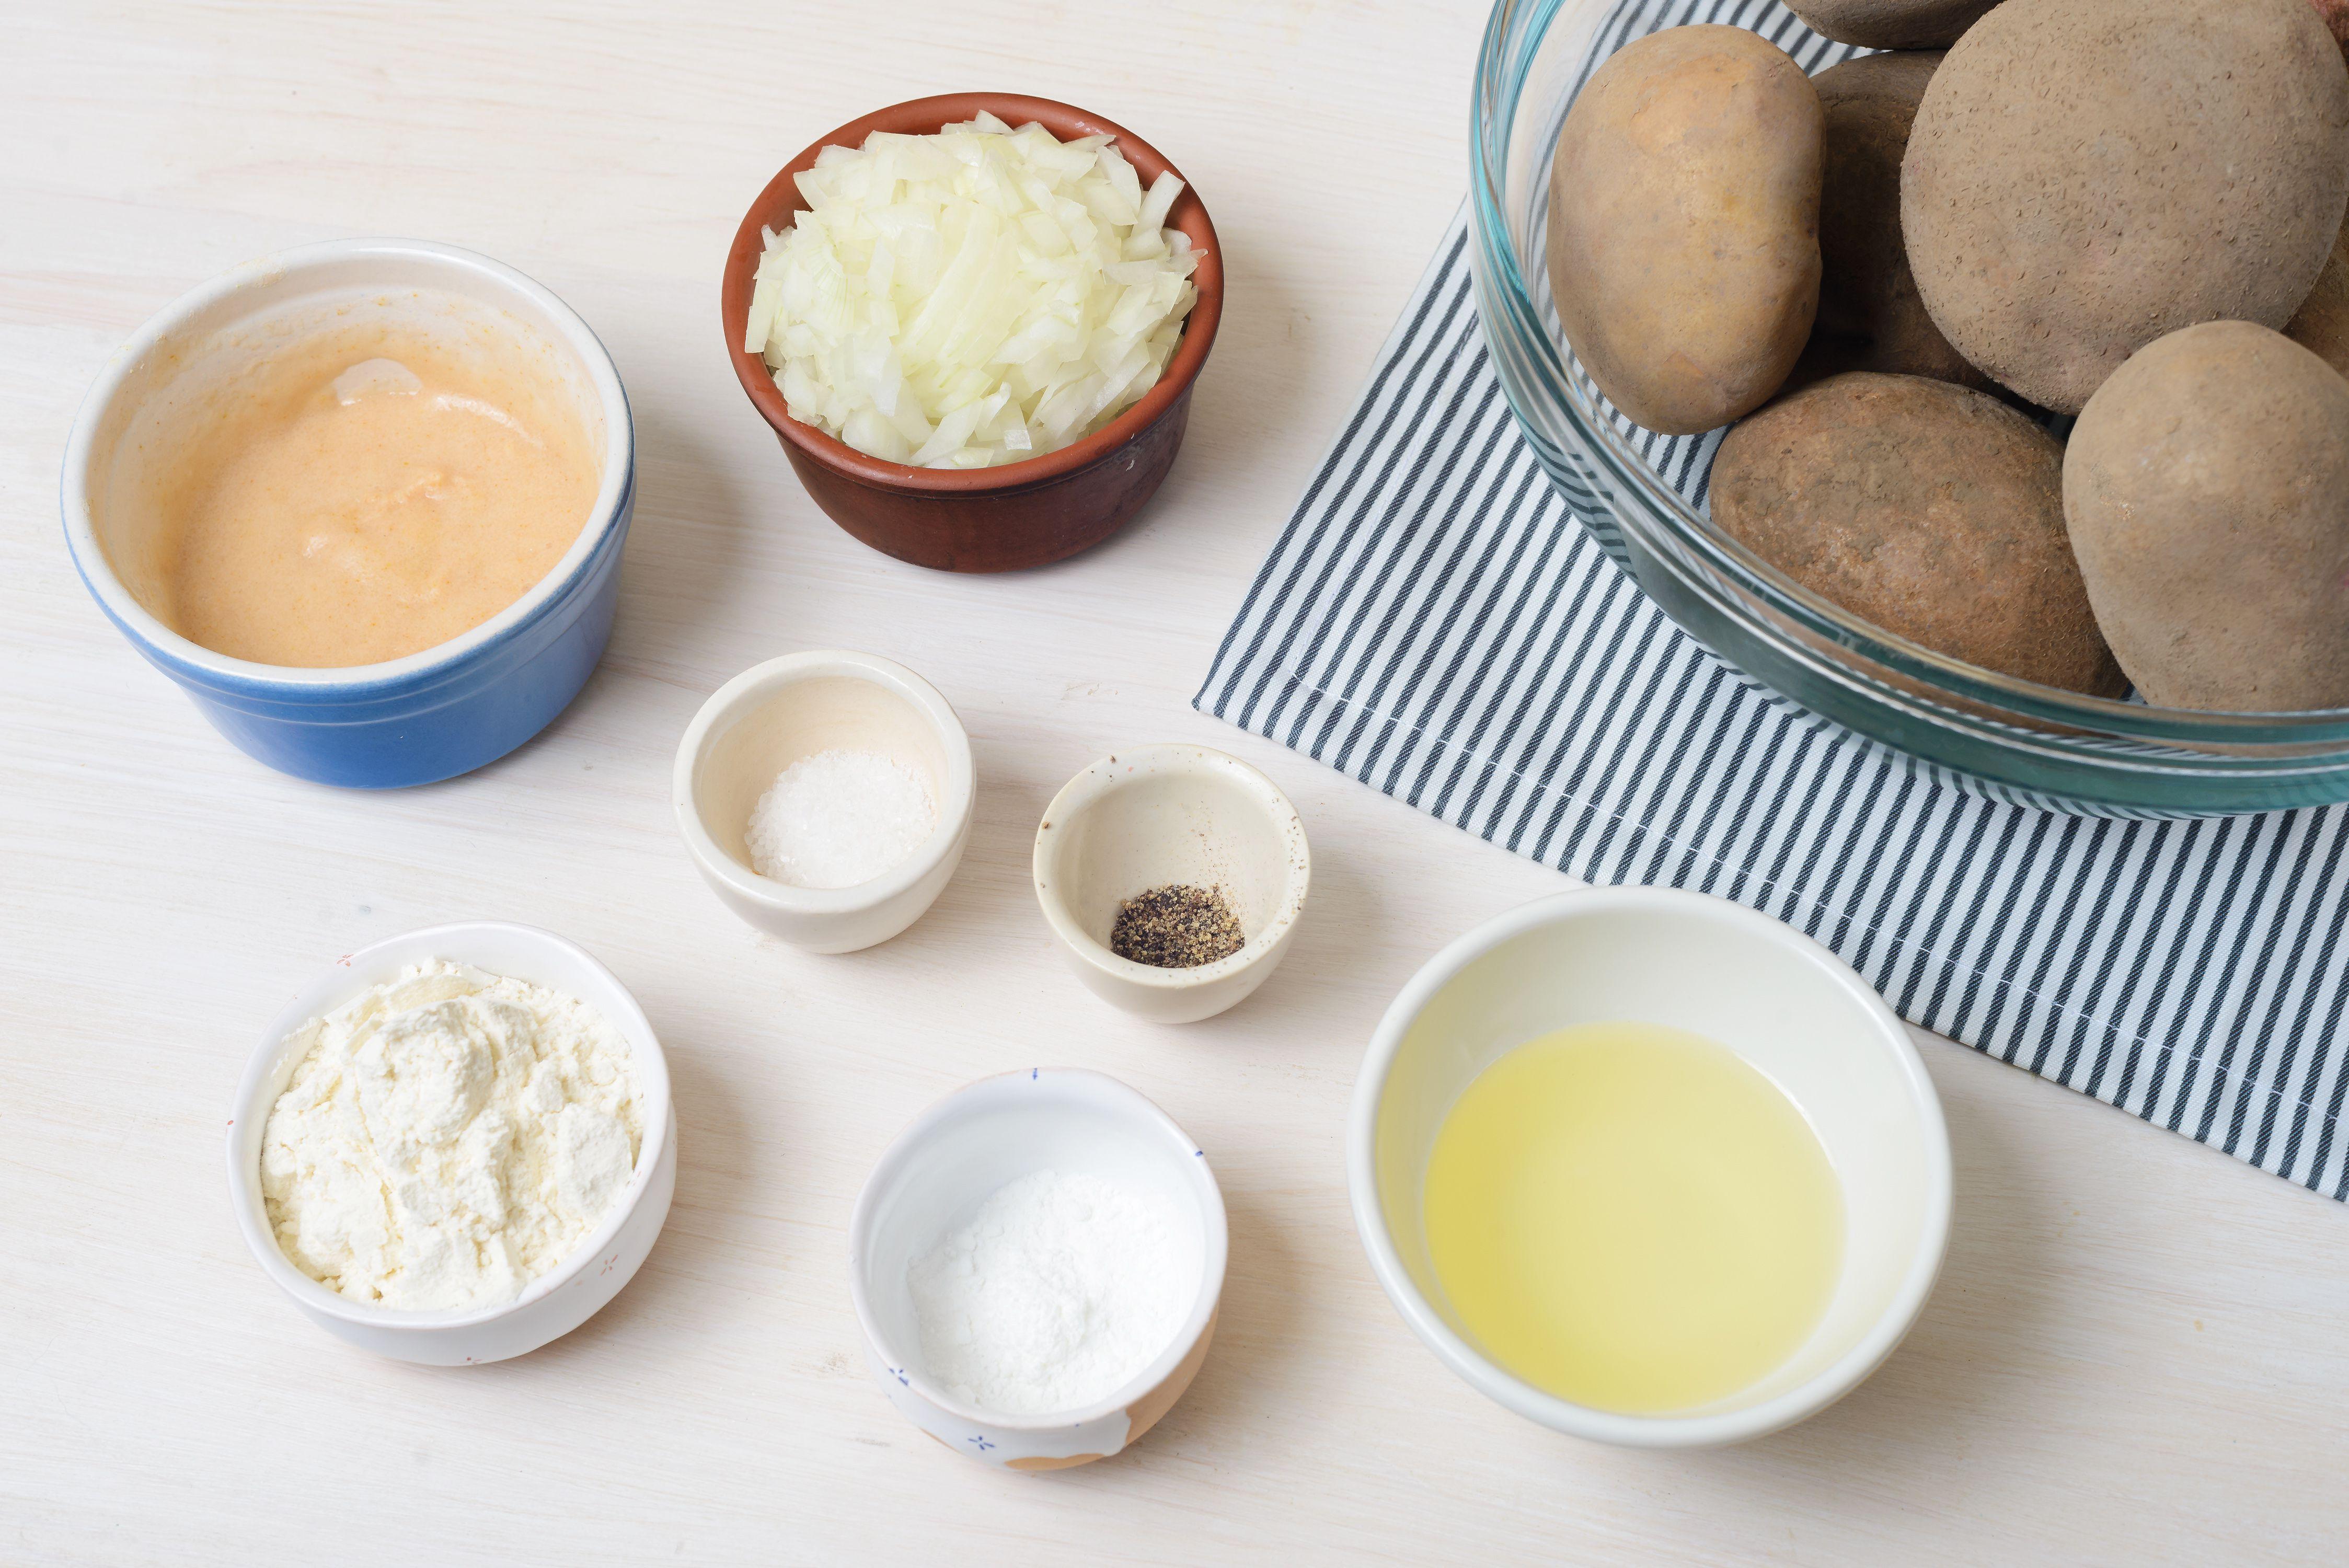 Ingredients for latkes